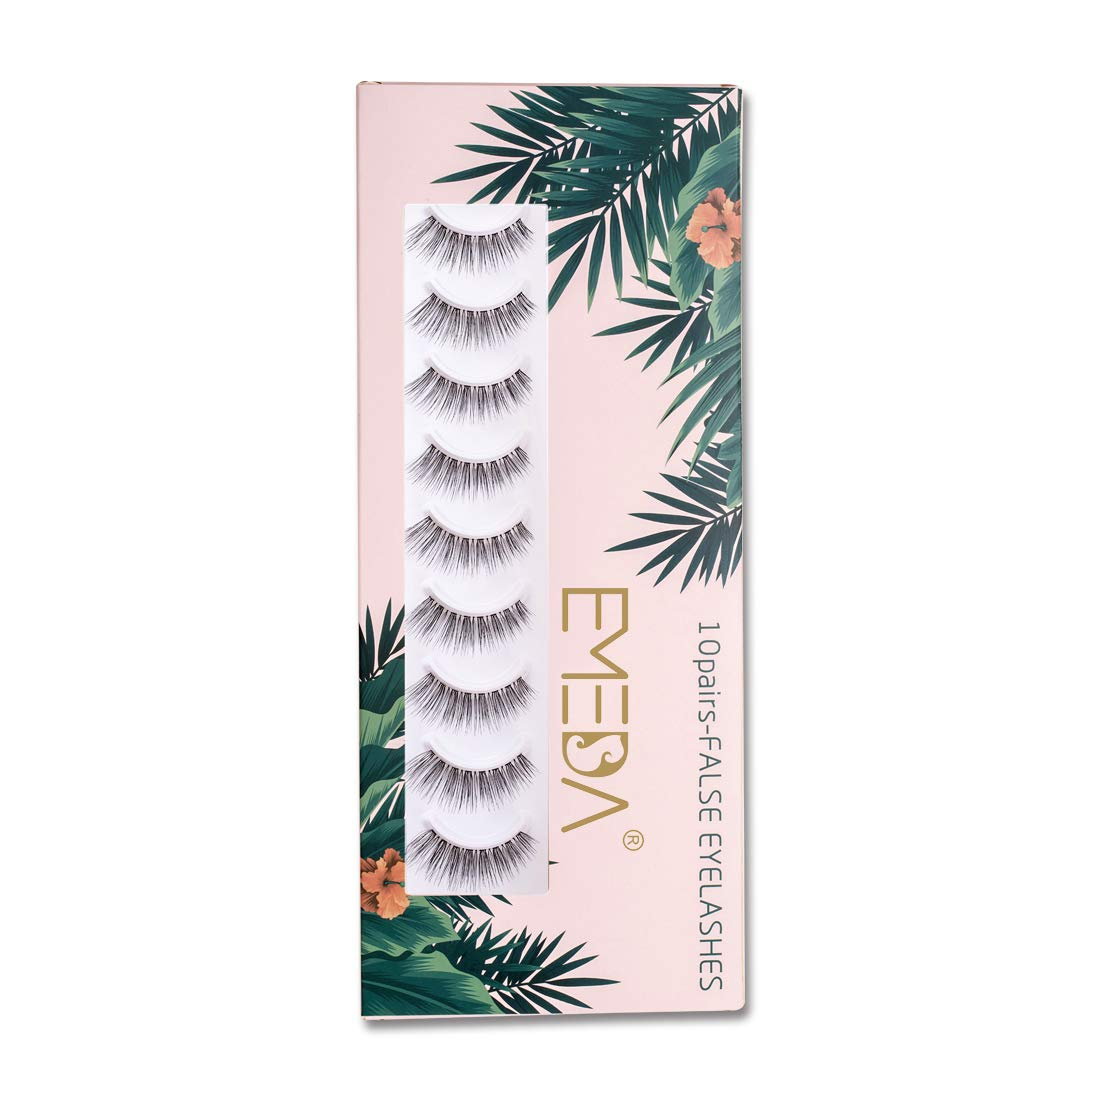 False Eyelashes Natural Look 10 Pairs 3D Fake Lashes Small Face Eyelashes 100% Handmade Lashes Wispies Short Soft Reusable Eye Lash Transparent Band Eyelash 1 Pack with Applicators by EMEDA